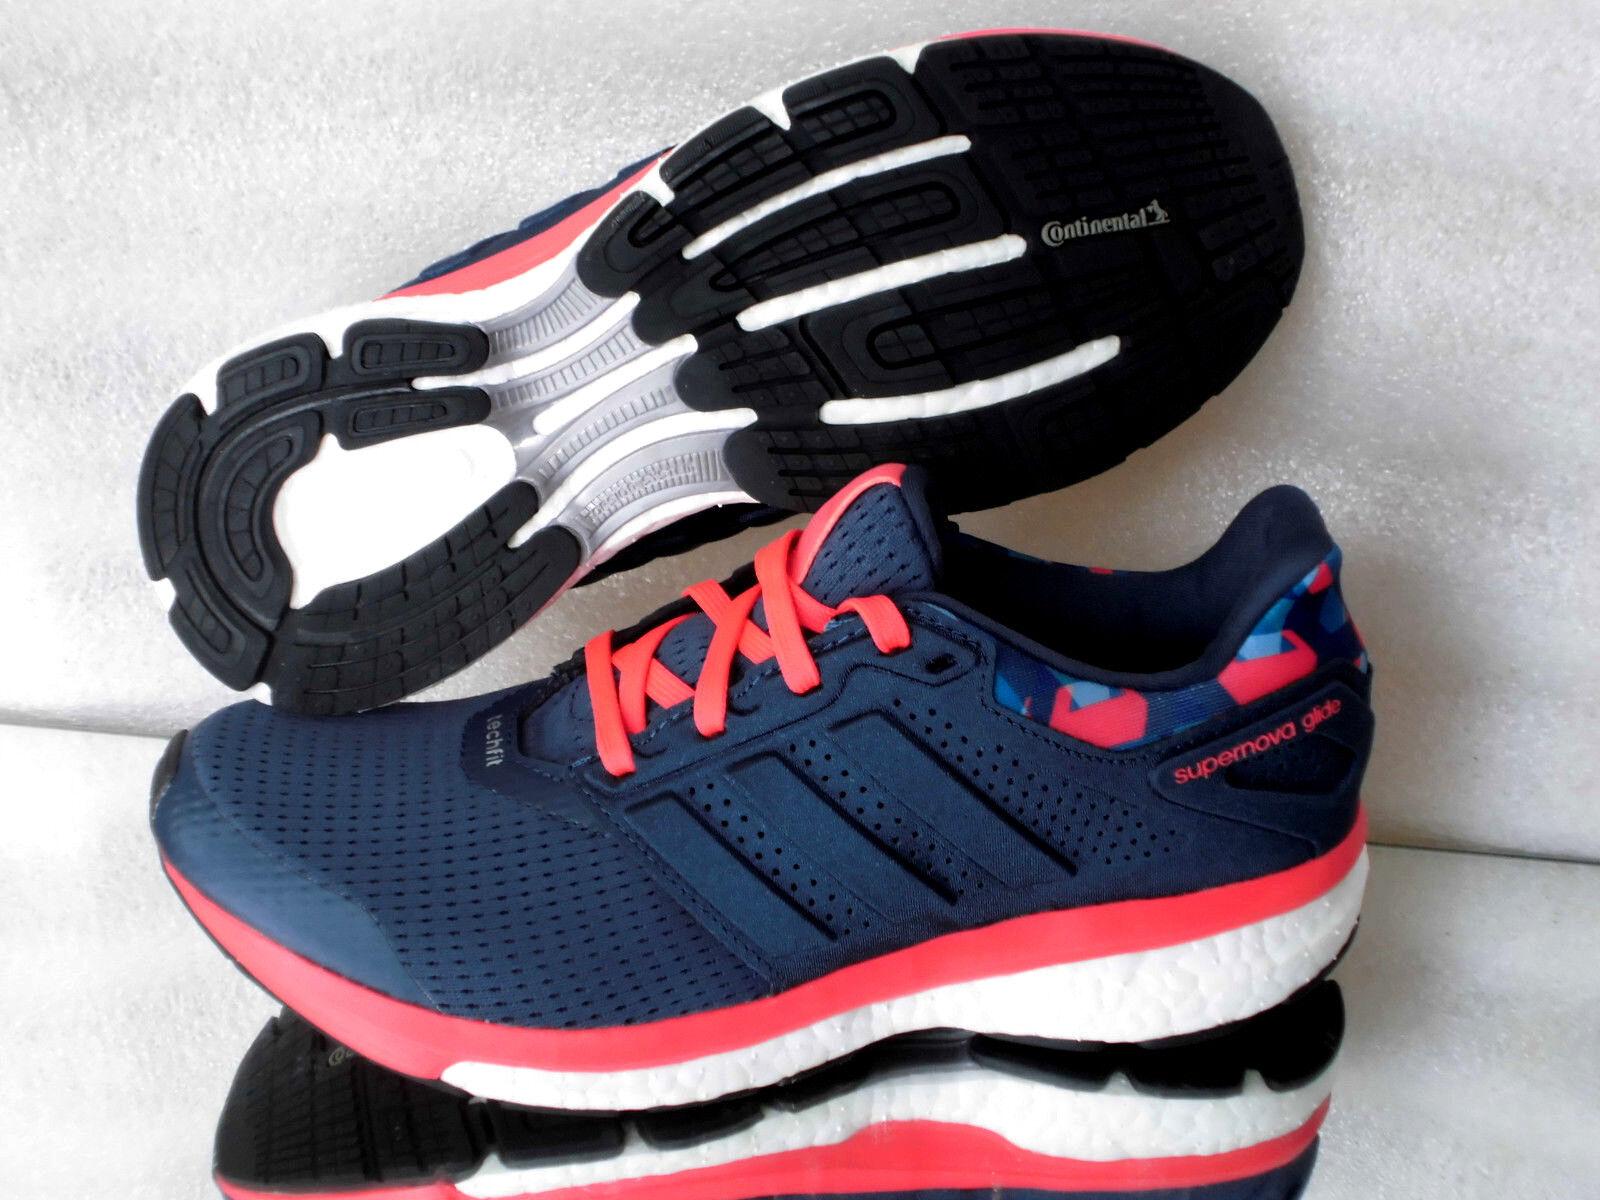 Adidas supernova Glide 8  GMX W aq5059 fitness  8 & corre zapatillas de deporte cortos azul Nuevo b31c19